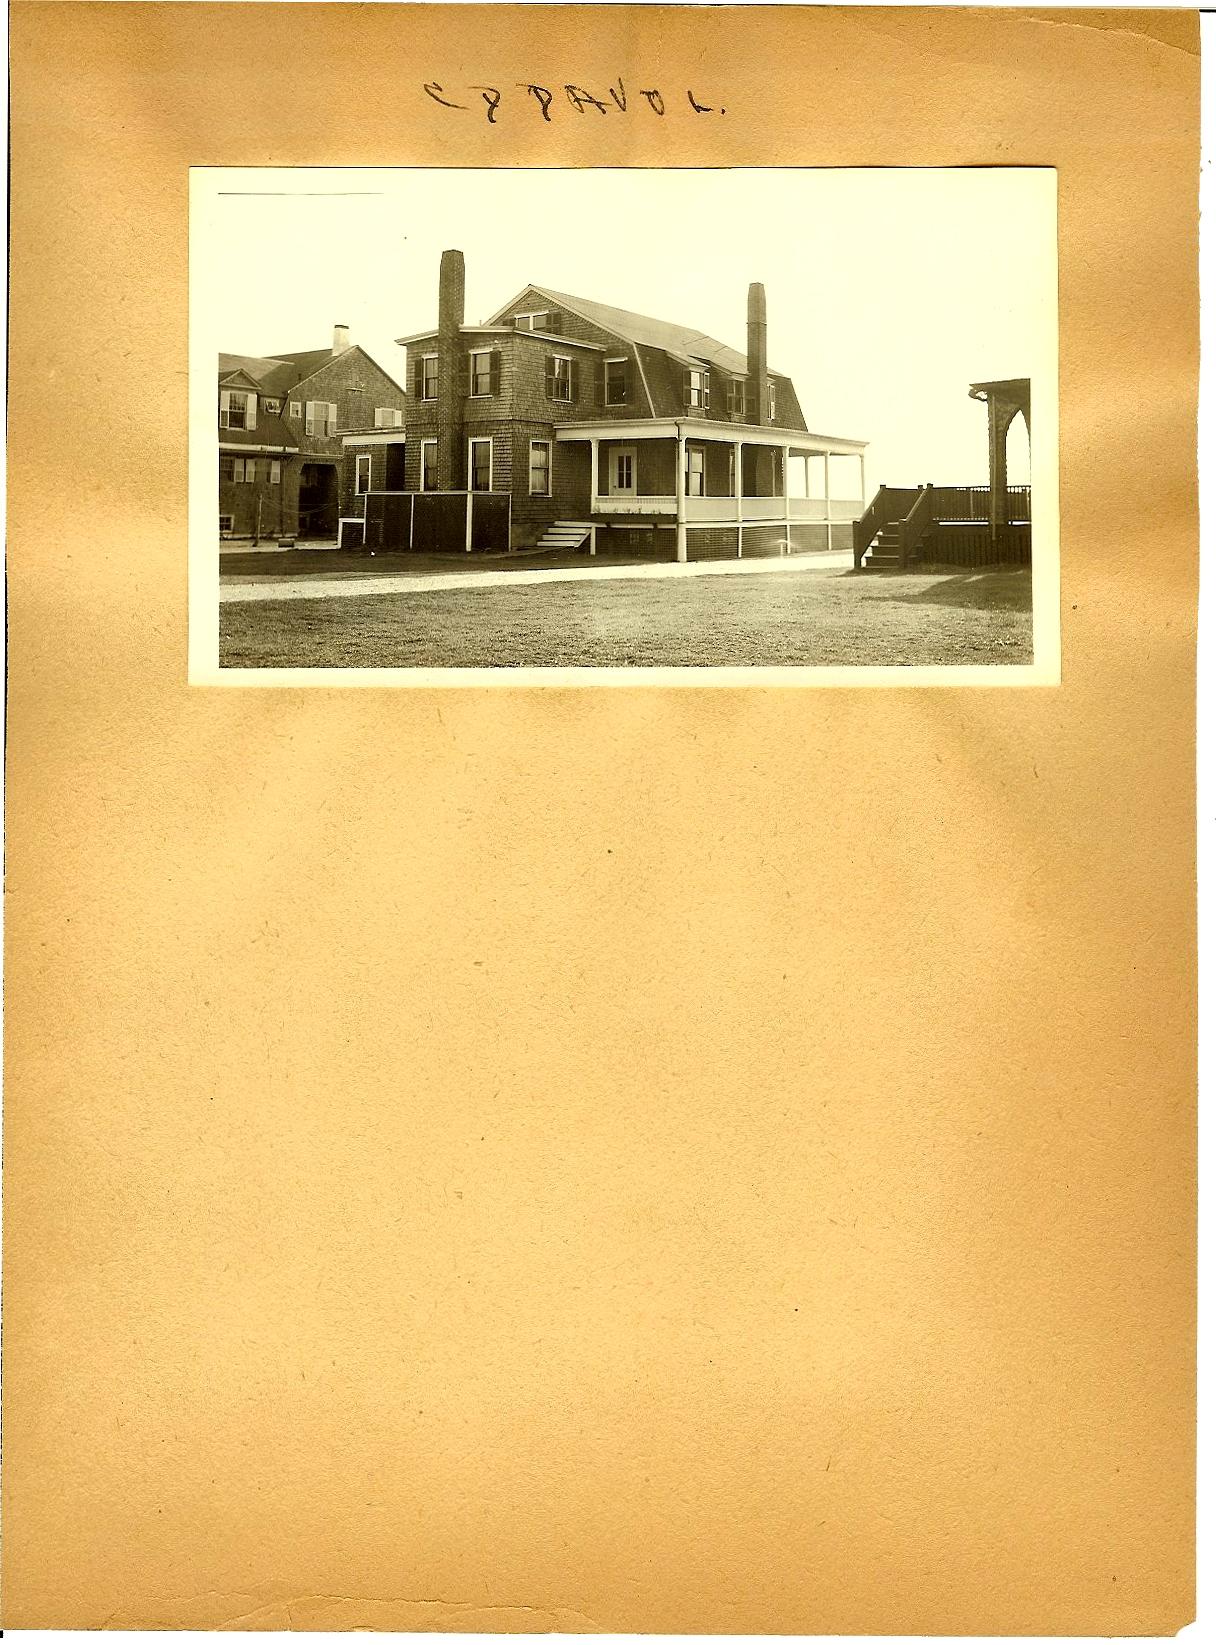 The 1938 Hurricane photos p7